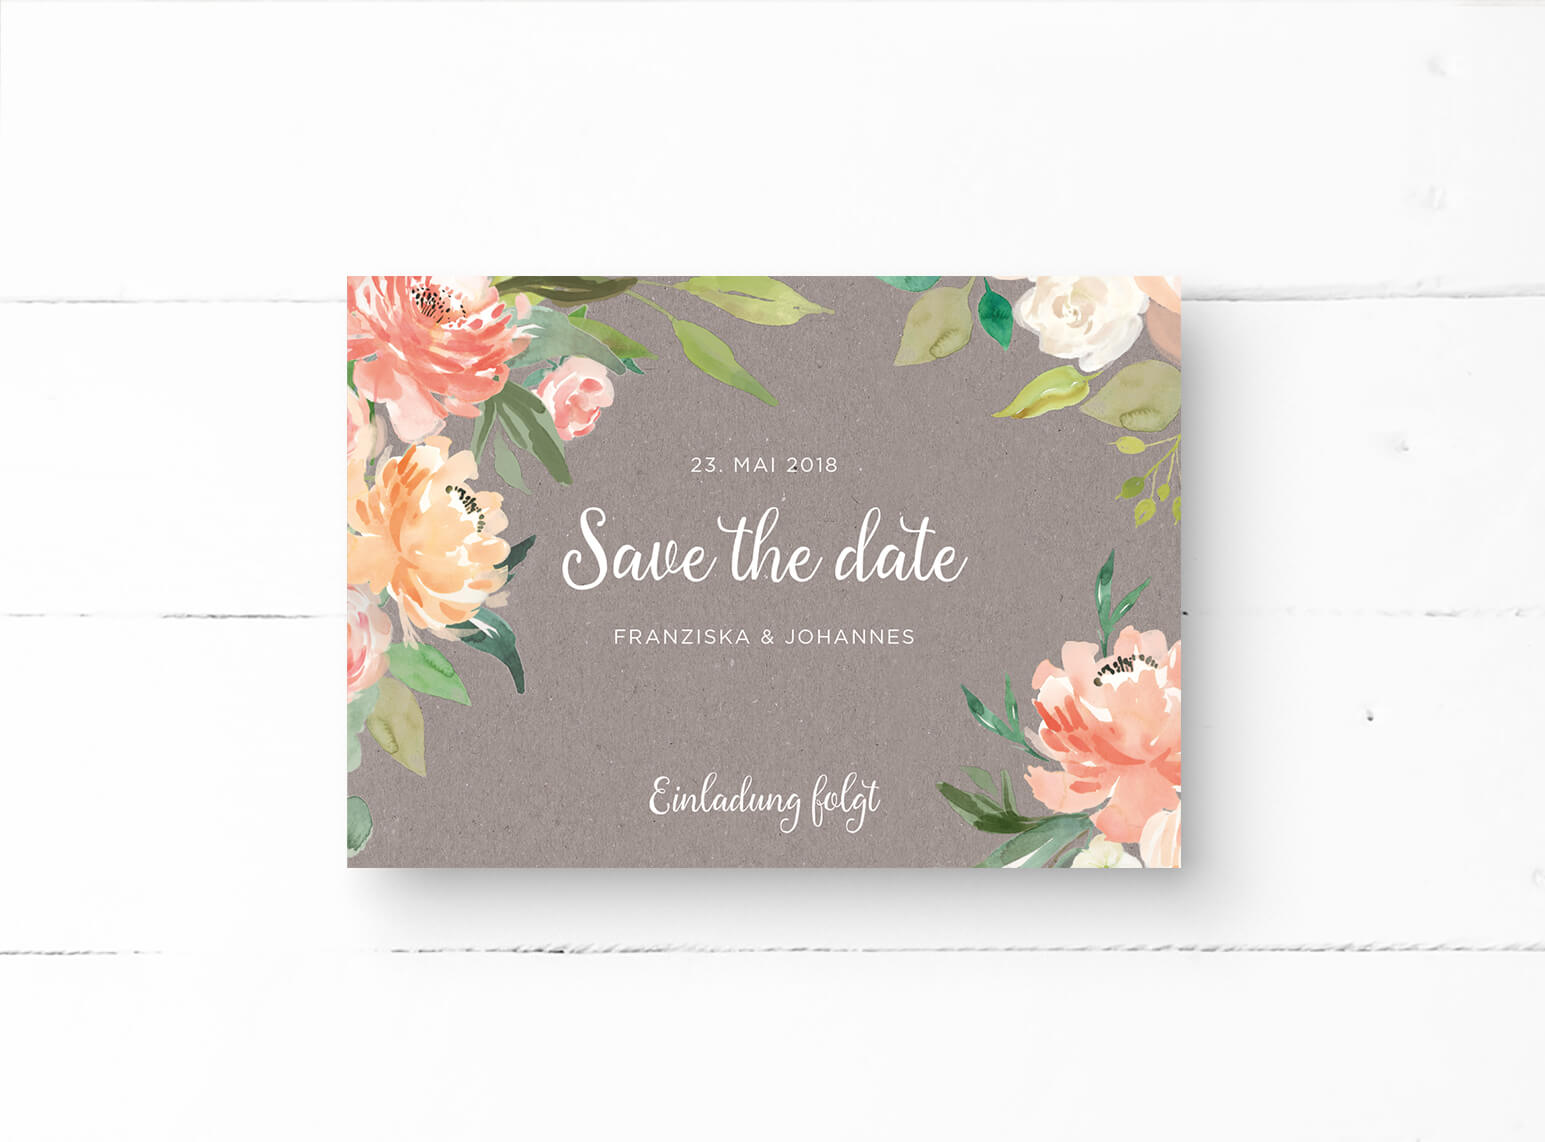 save-the-date-postkarte-aquarell-blumen-kraftpapier_front_MP0007-1.0.2